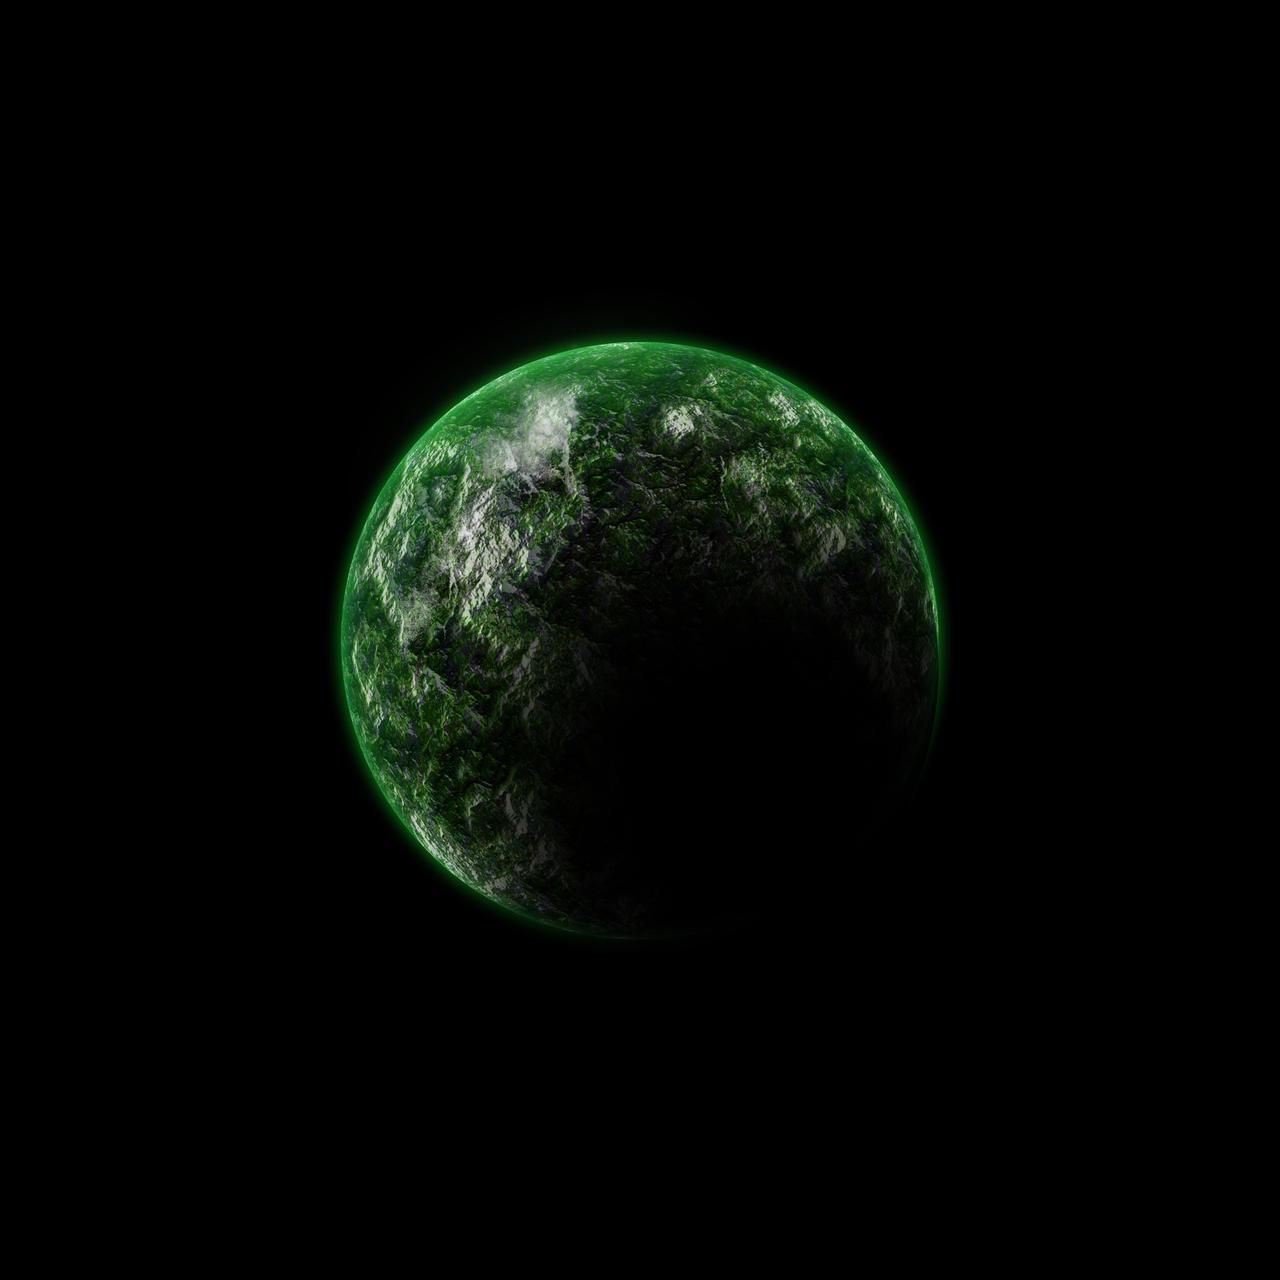 Green Planet by HugleBunnys